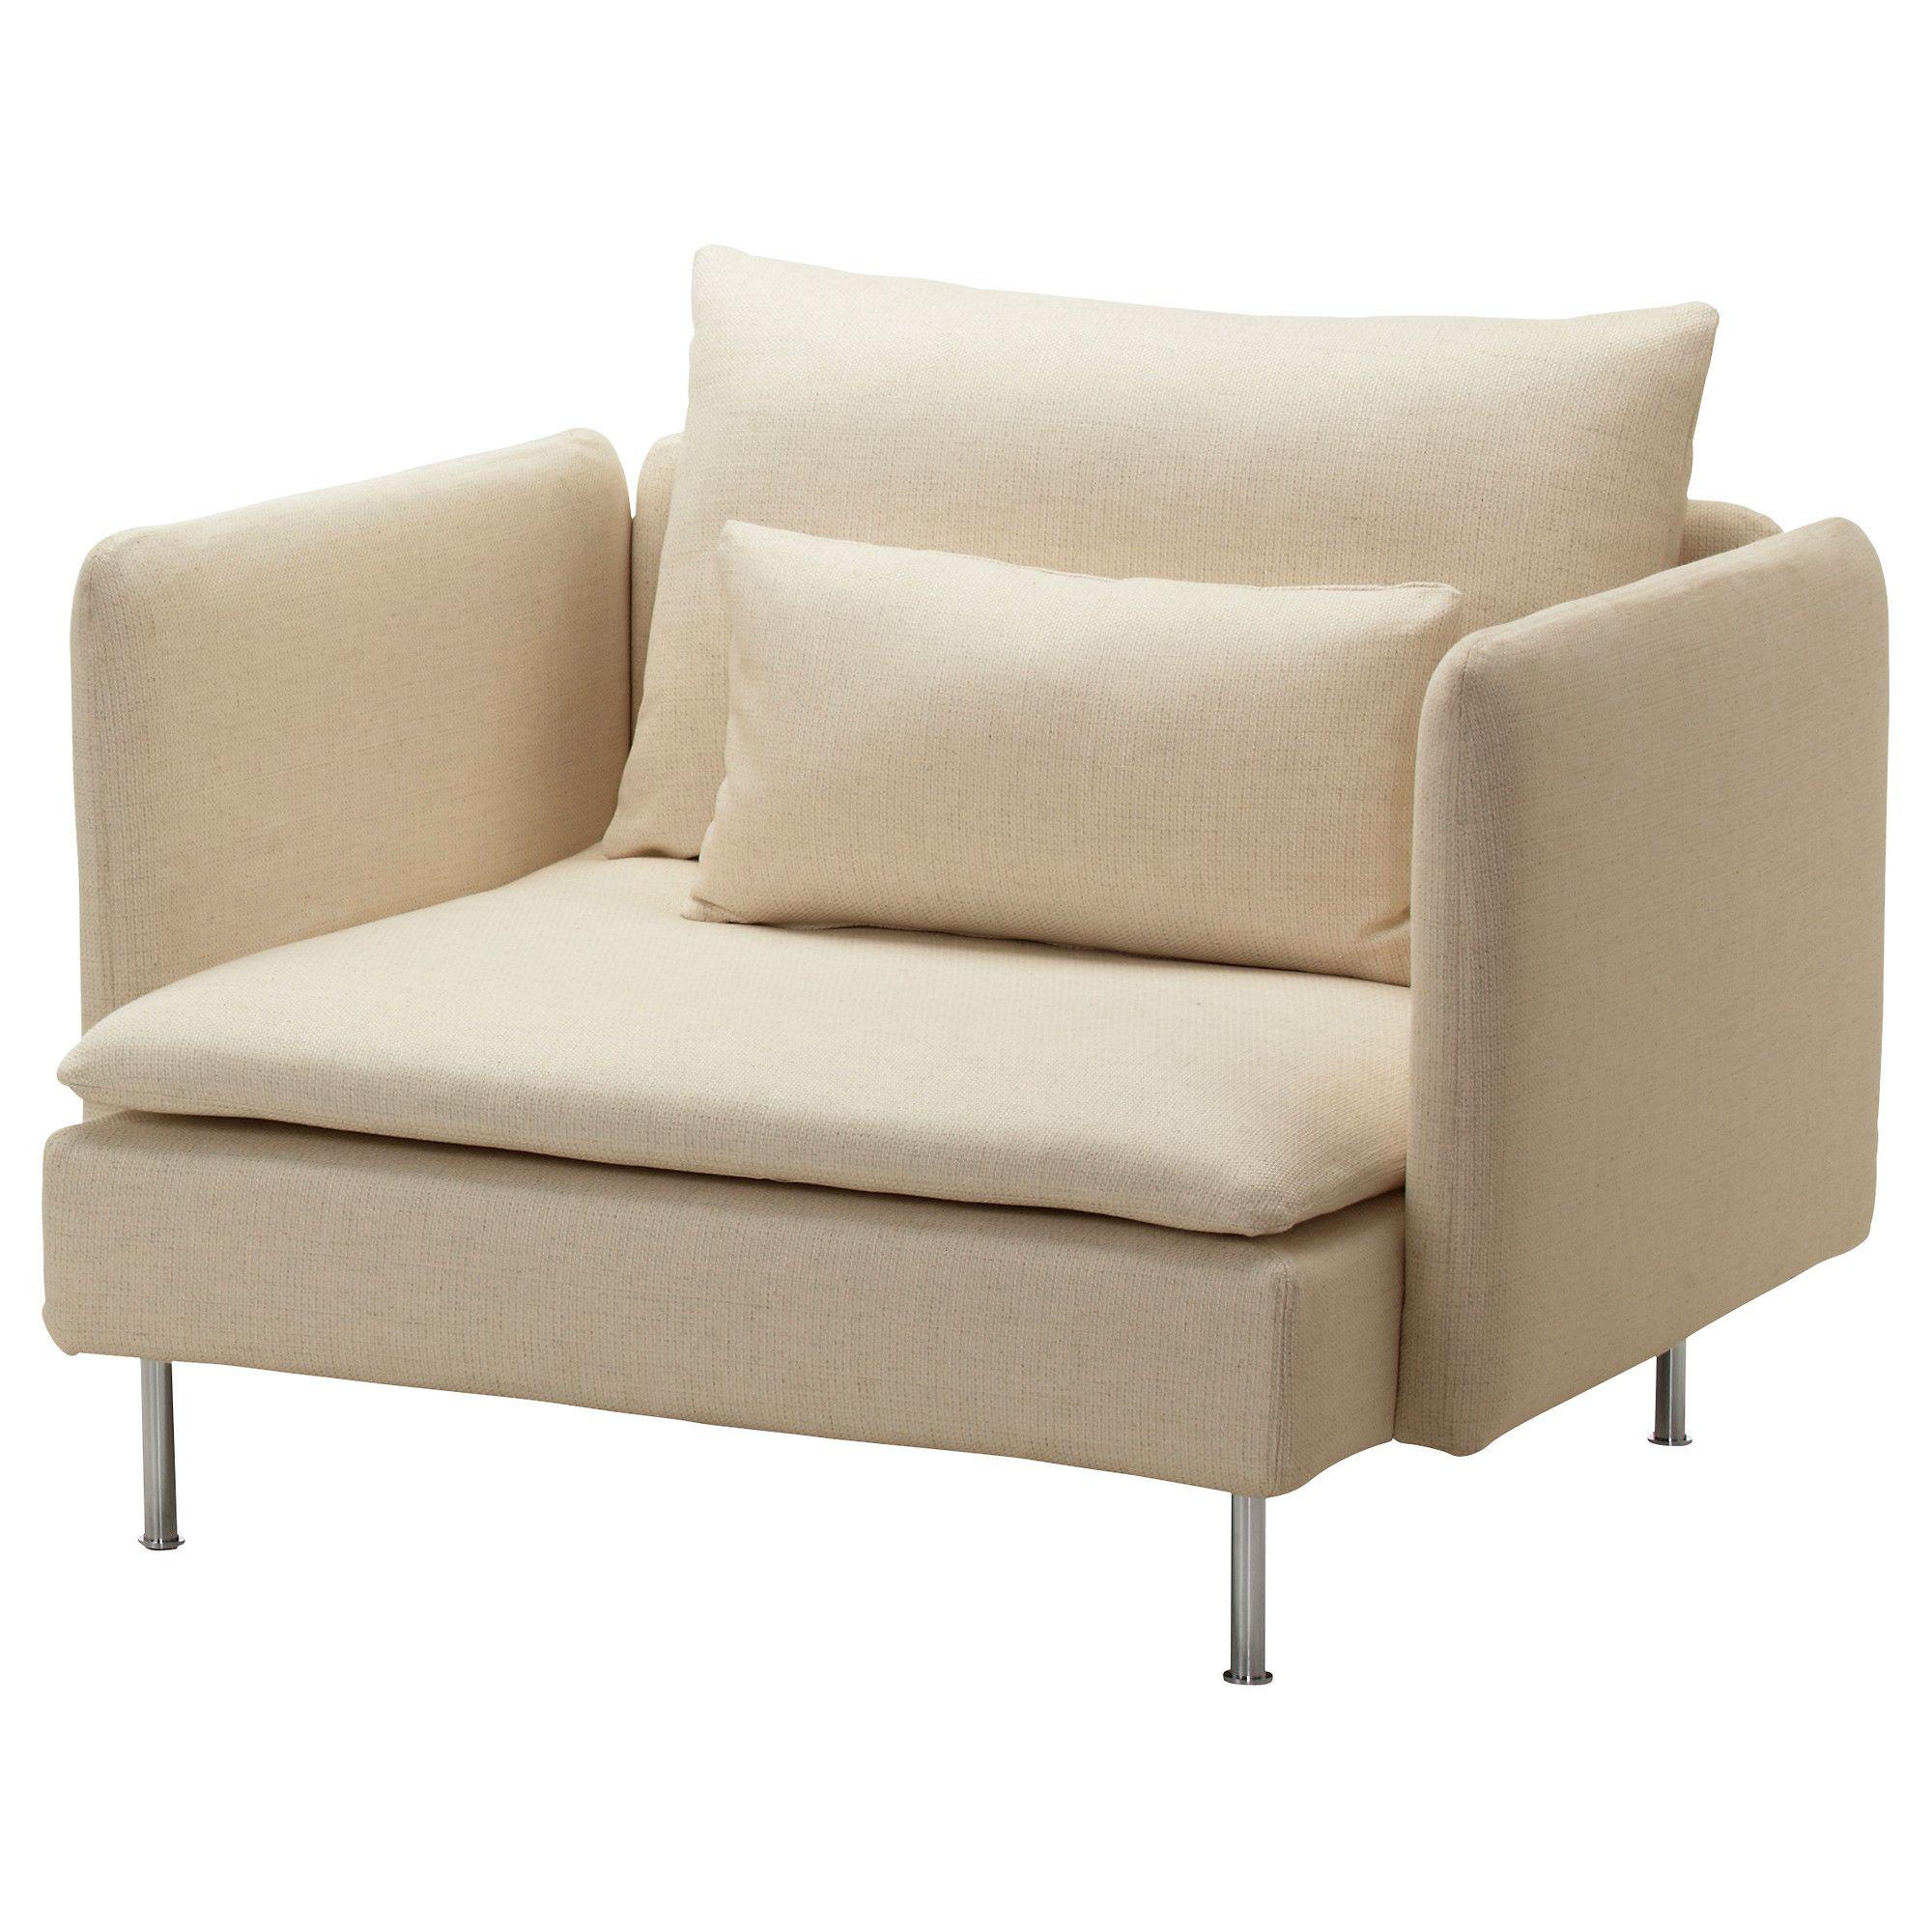 Australia Ikea chair, Ikea living room, Ikea